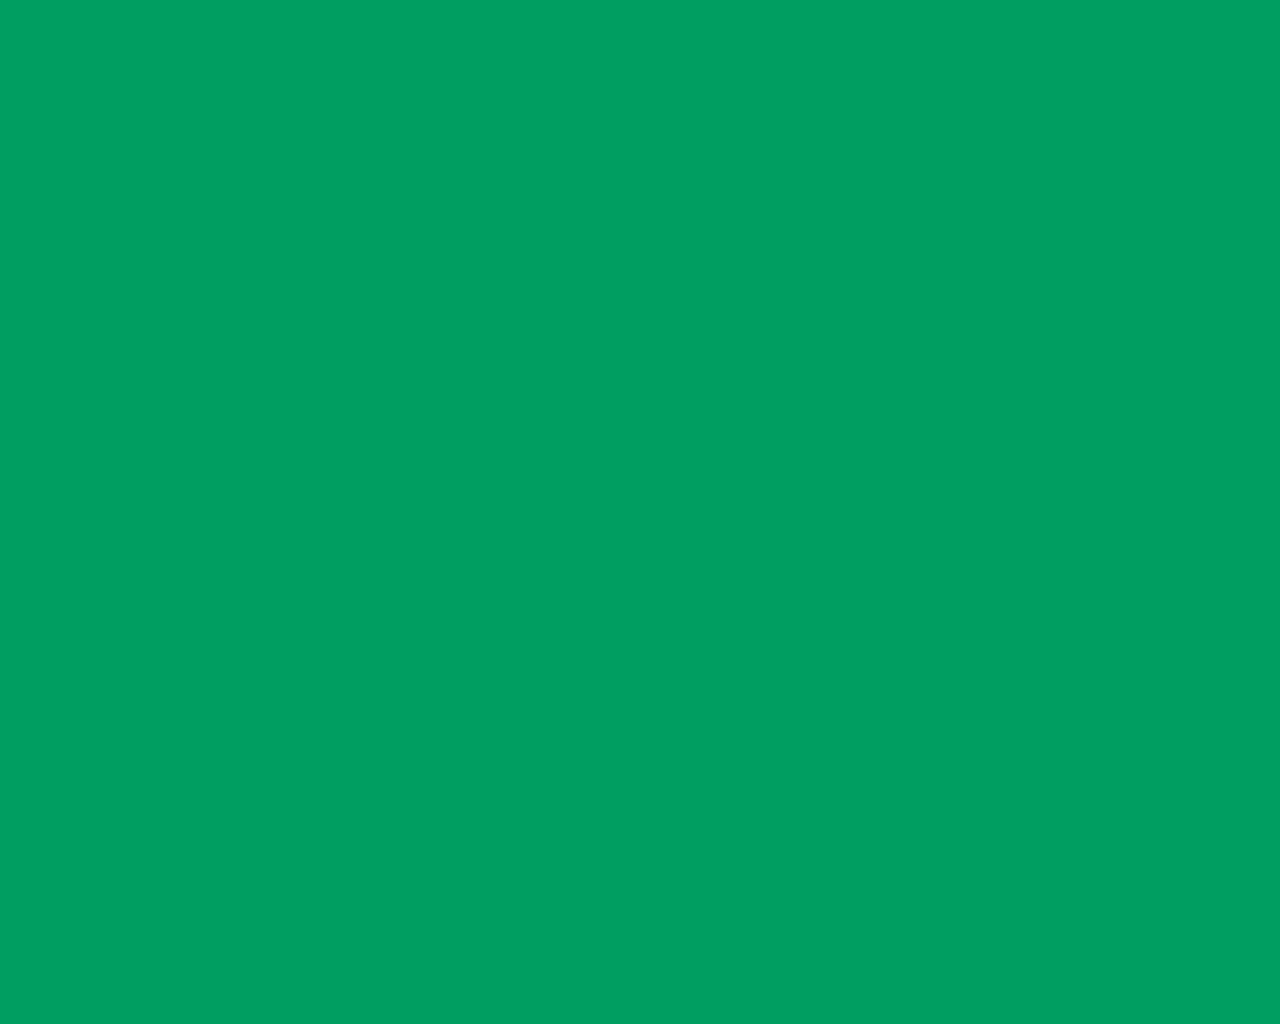 1280x1024 Shamrock Green Solid Color Background